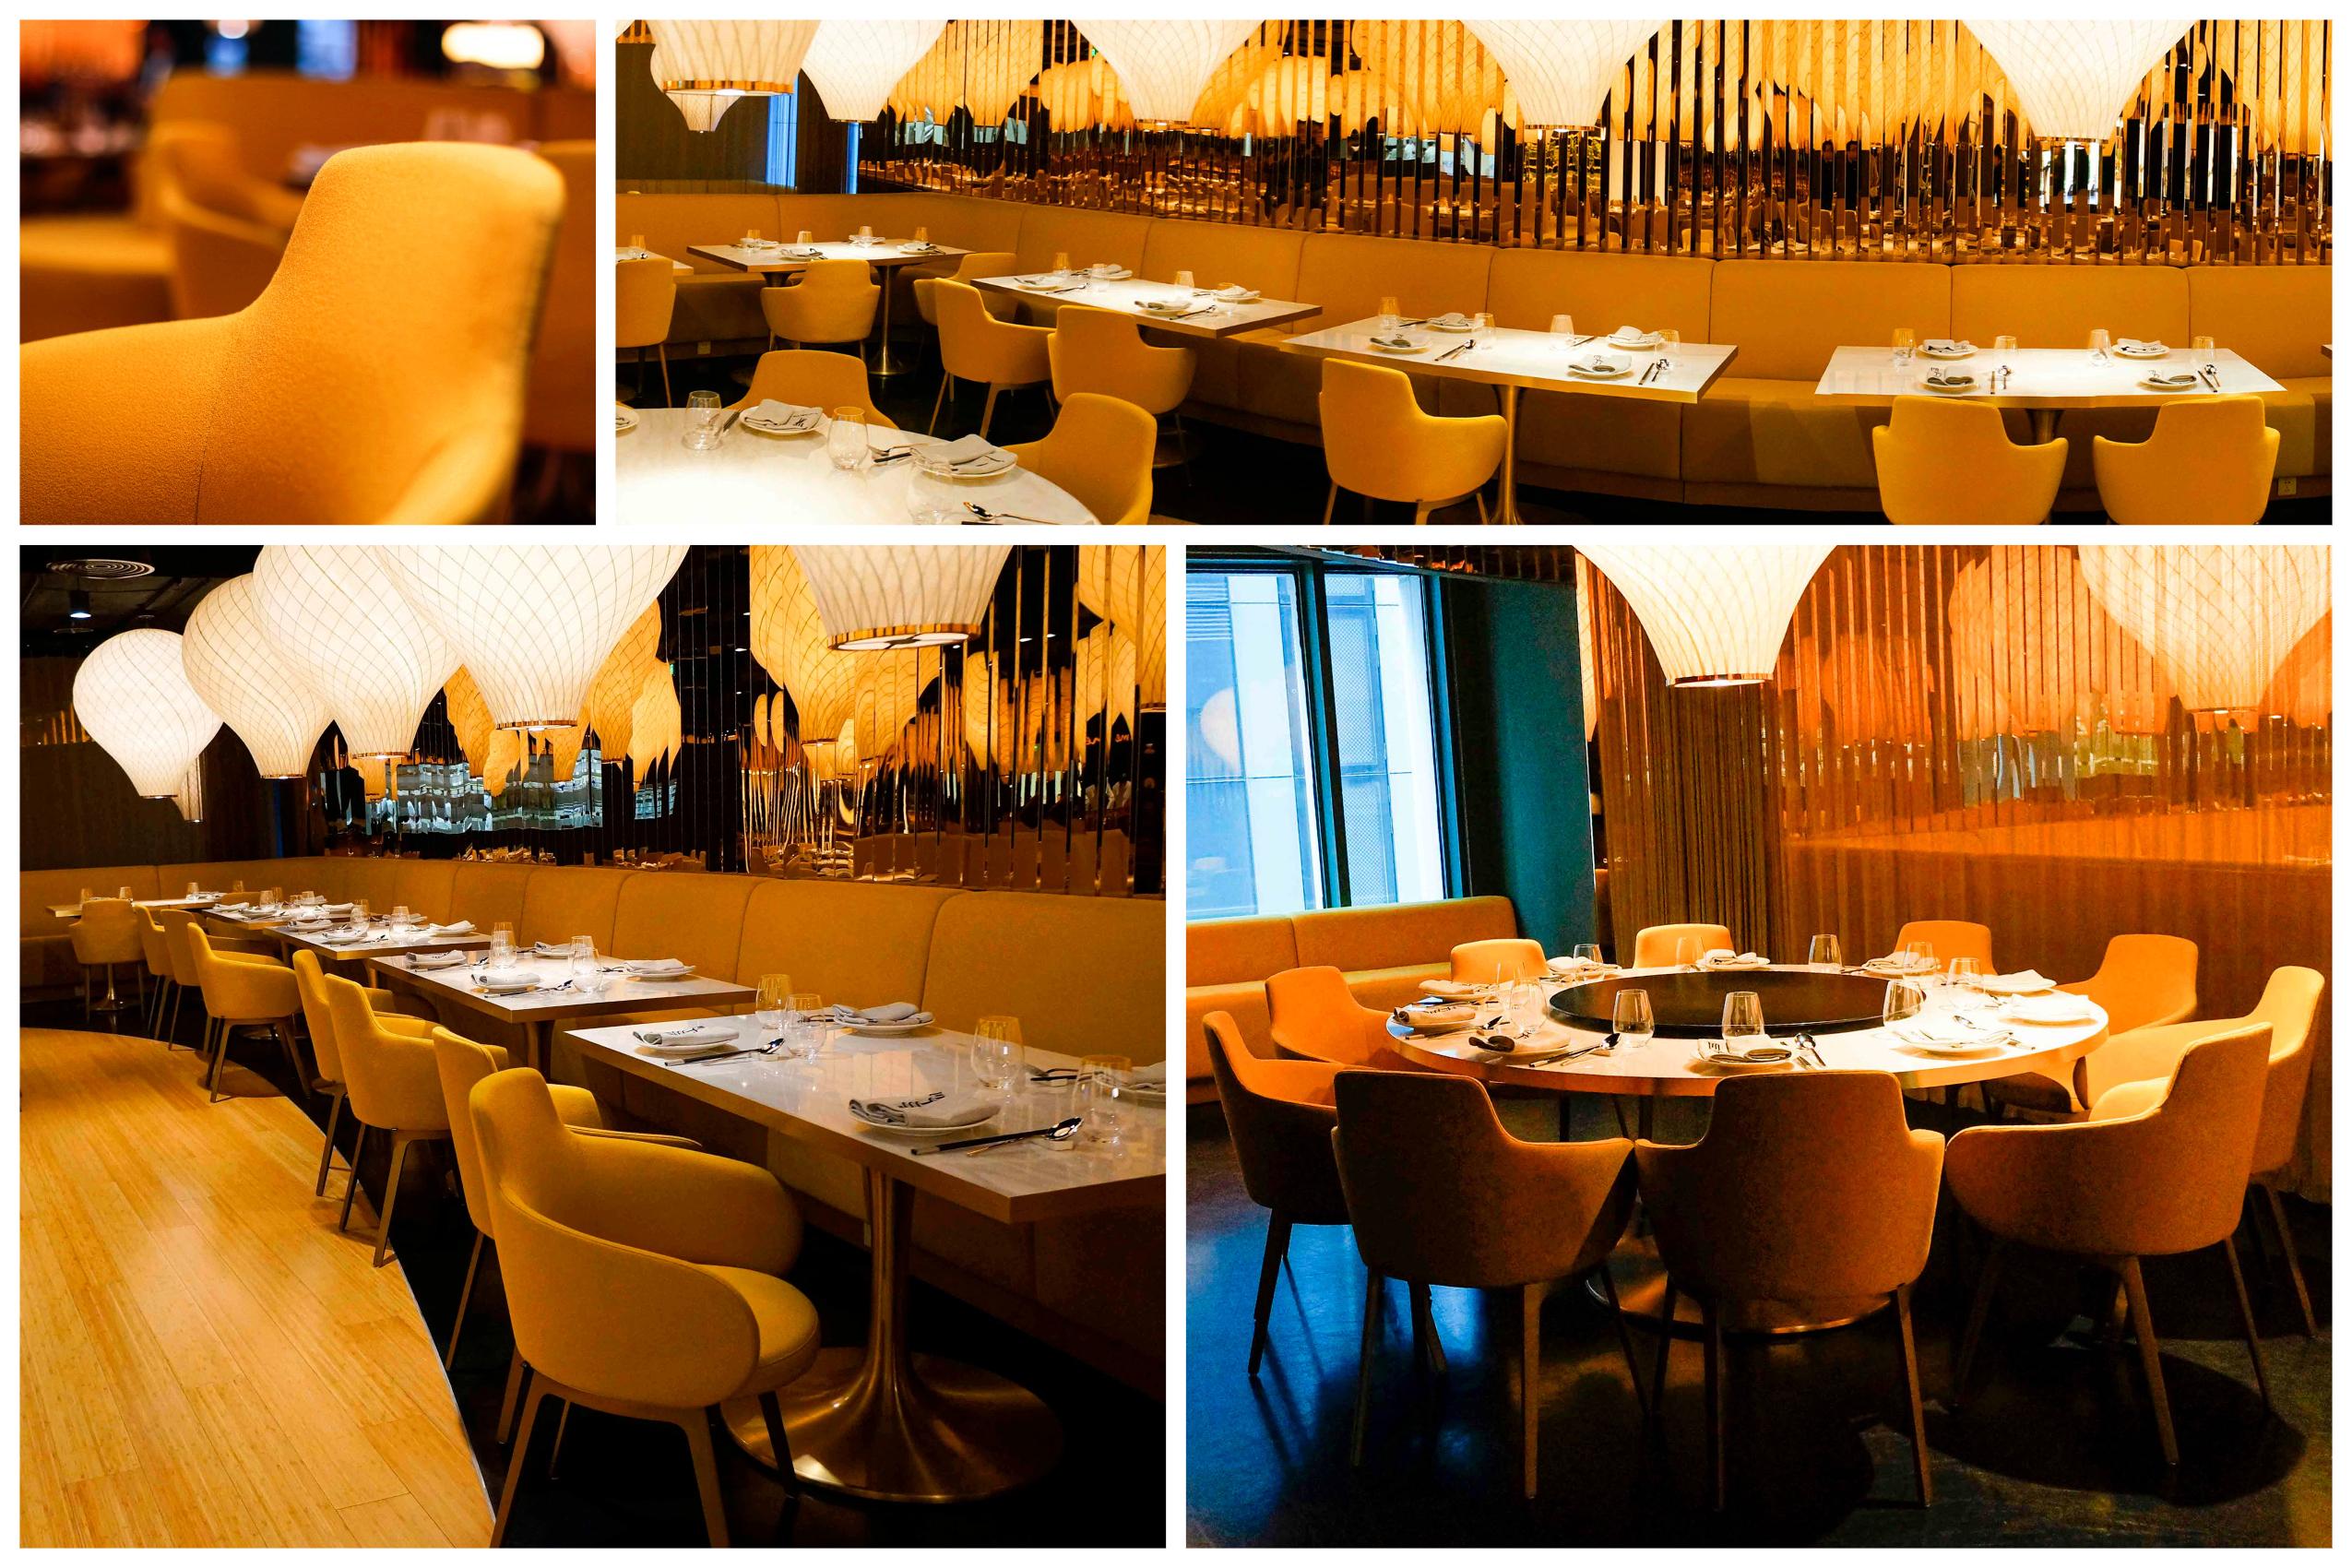 Mercedes Me Sifang Sanchuan Restaurant